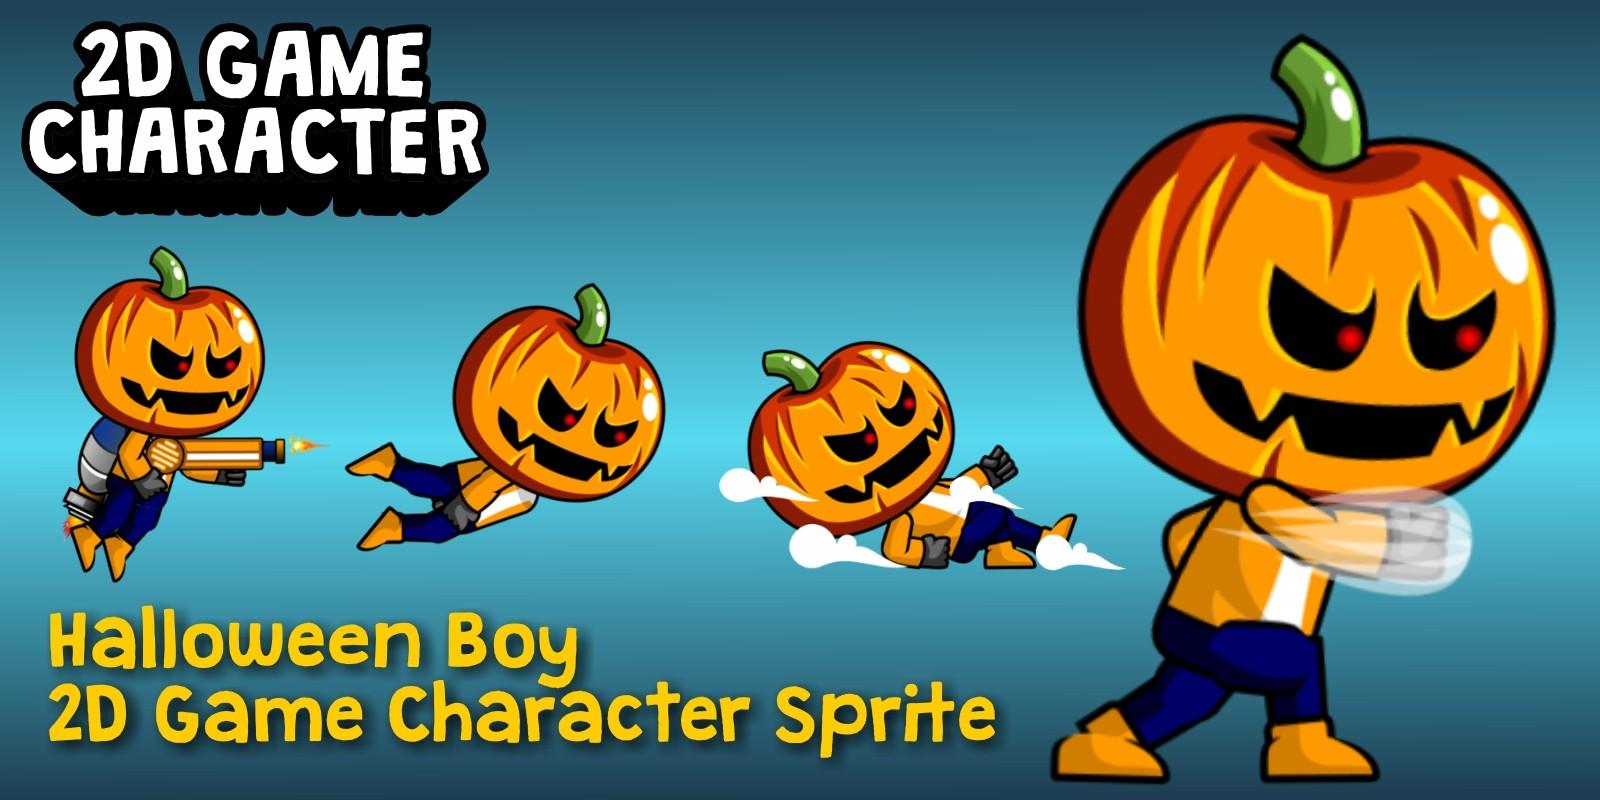 Halloween Boy 2D Game Character Sprite